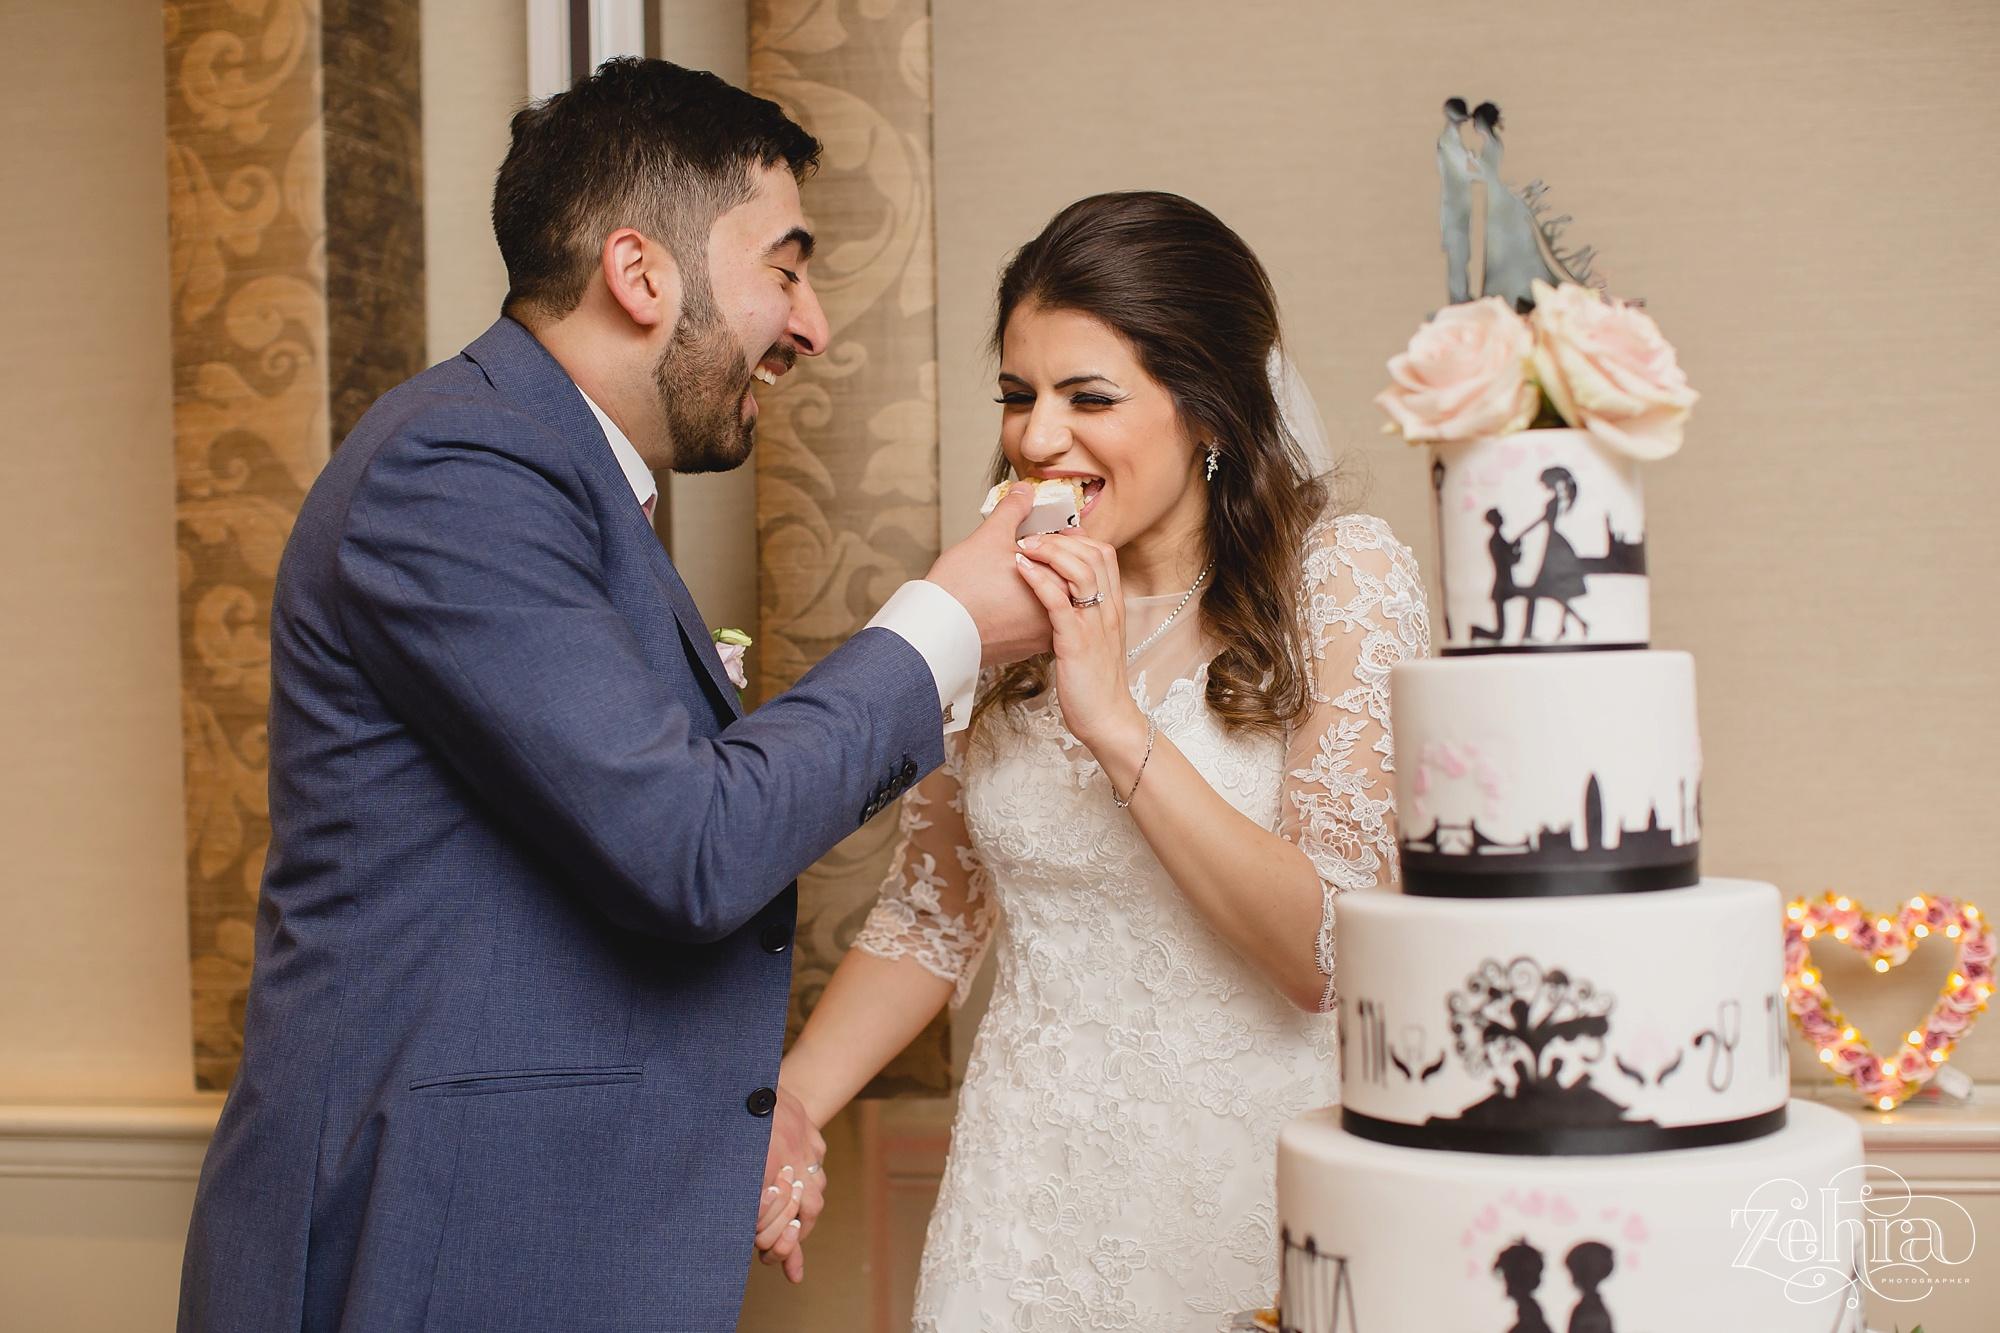 zehra photographer mere cheshire wedding_0045.jpg